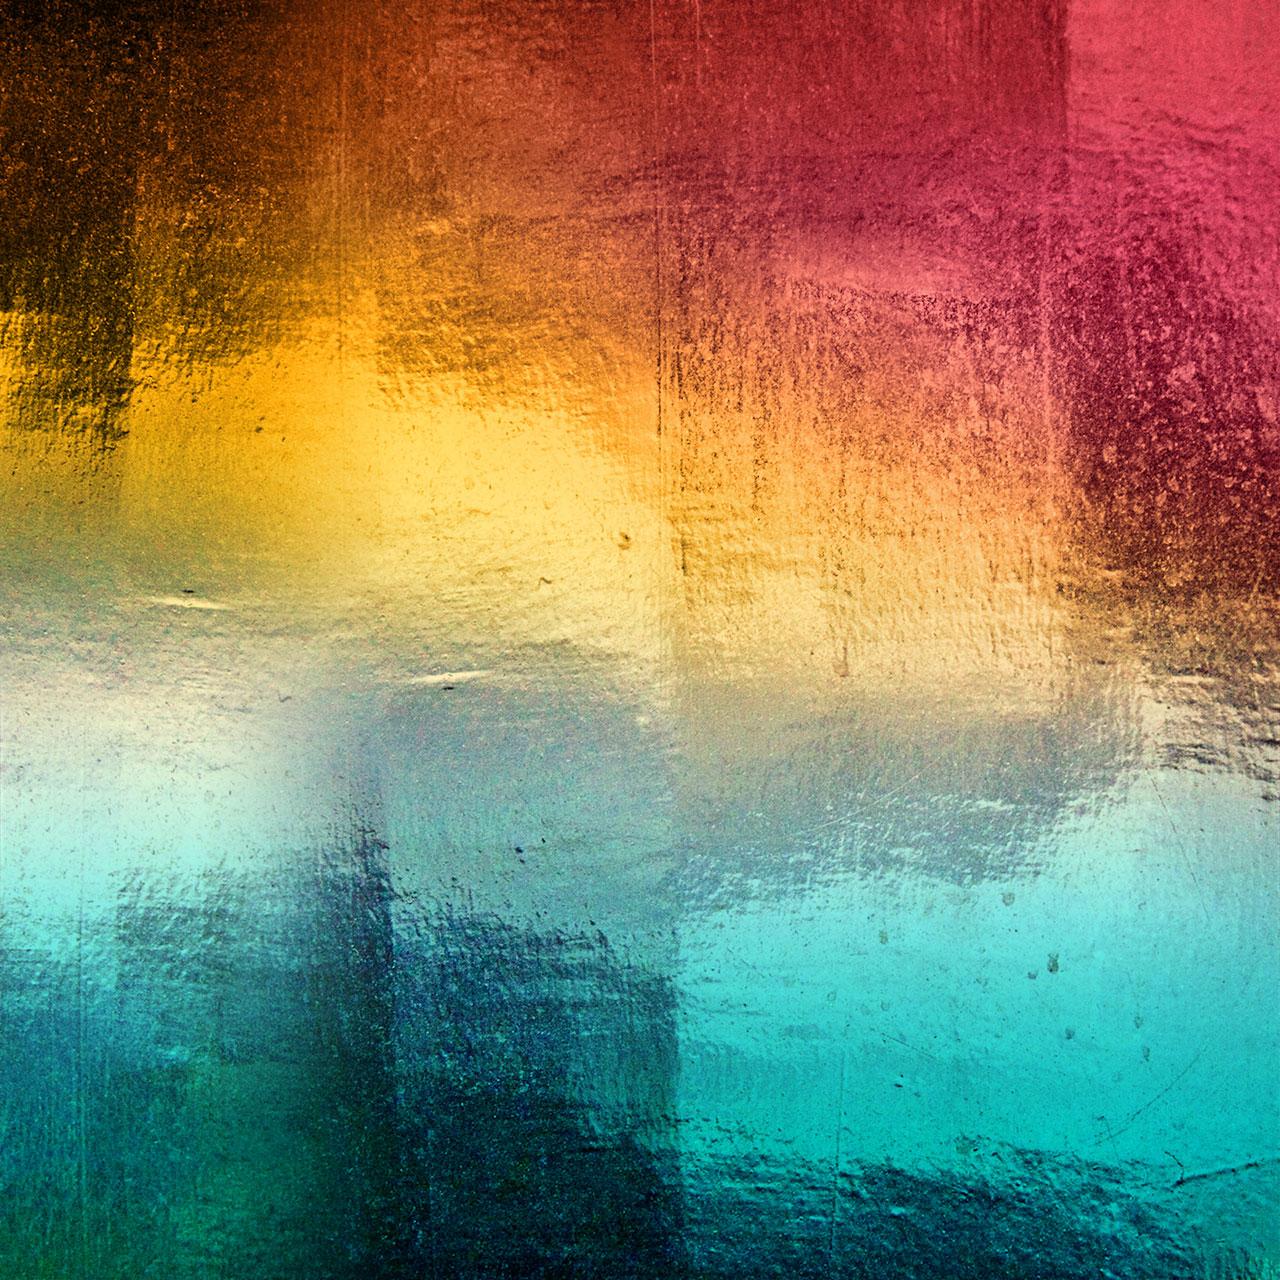 wallpaper_006.jpg